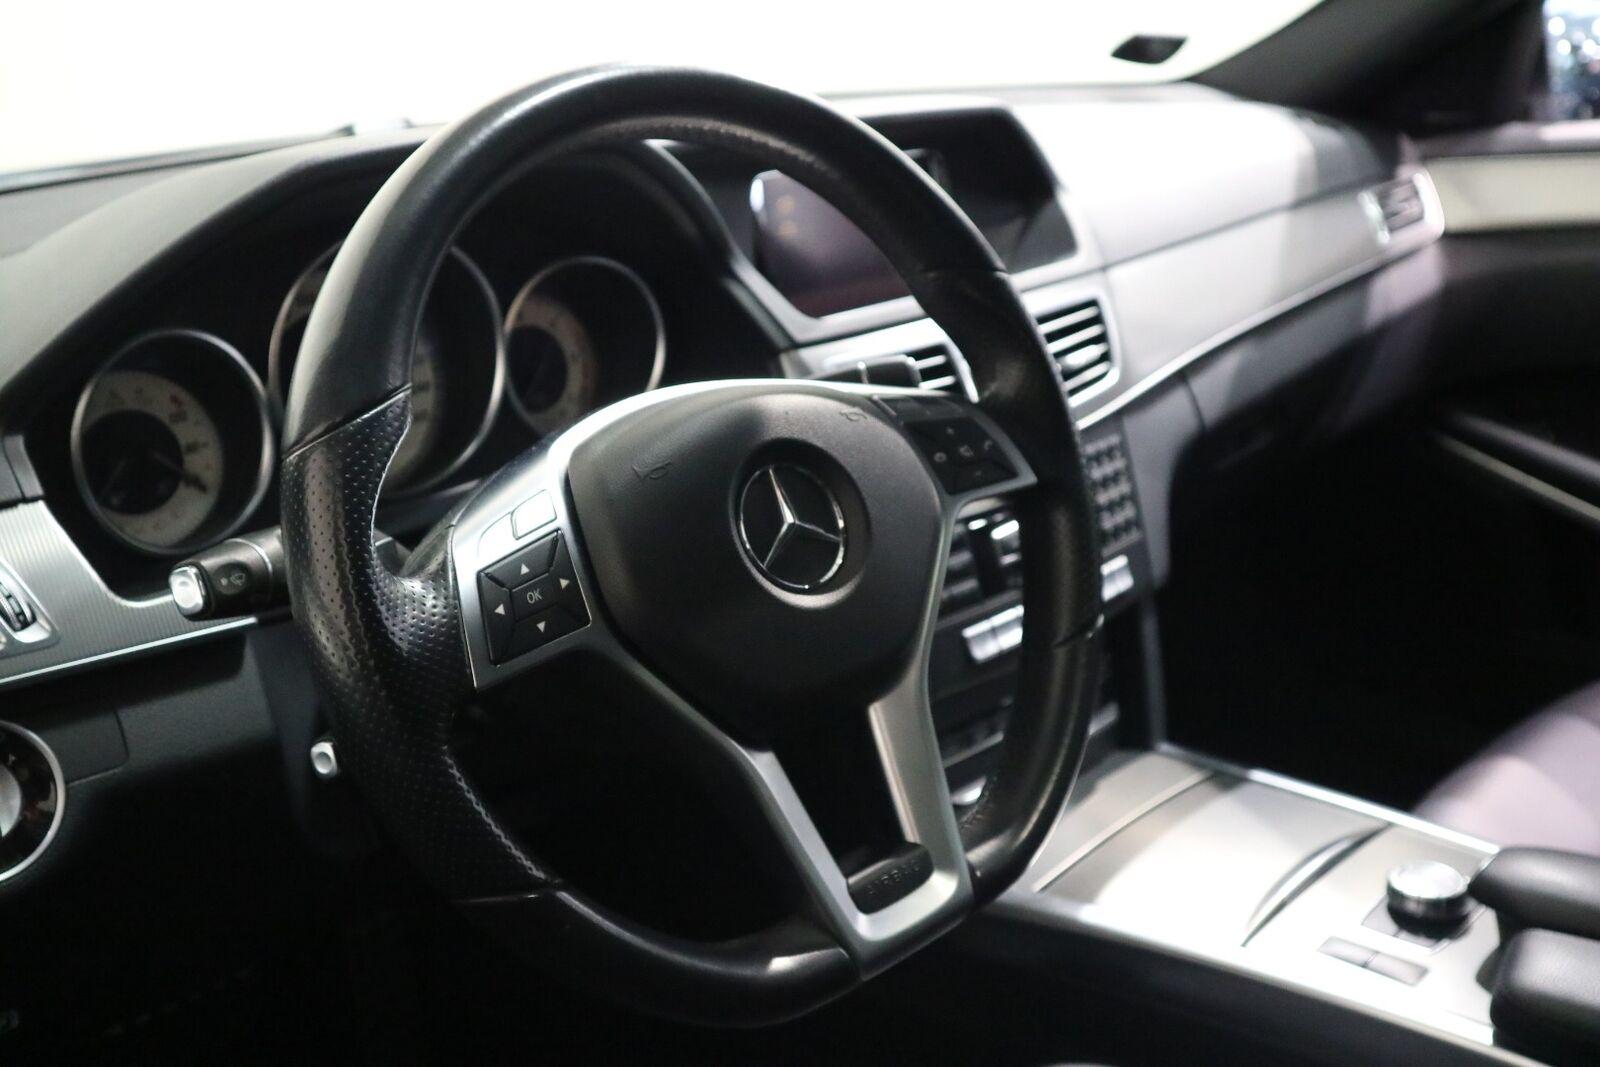 Mercedes E220 2,2 CDi Avantgarde AMG stc. aut. - billede 3